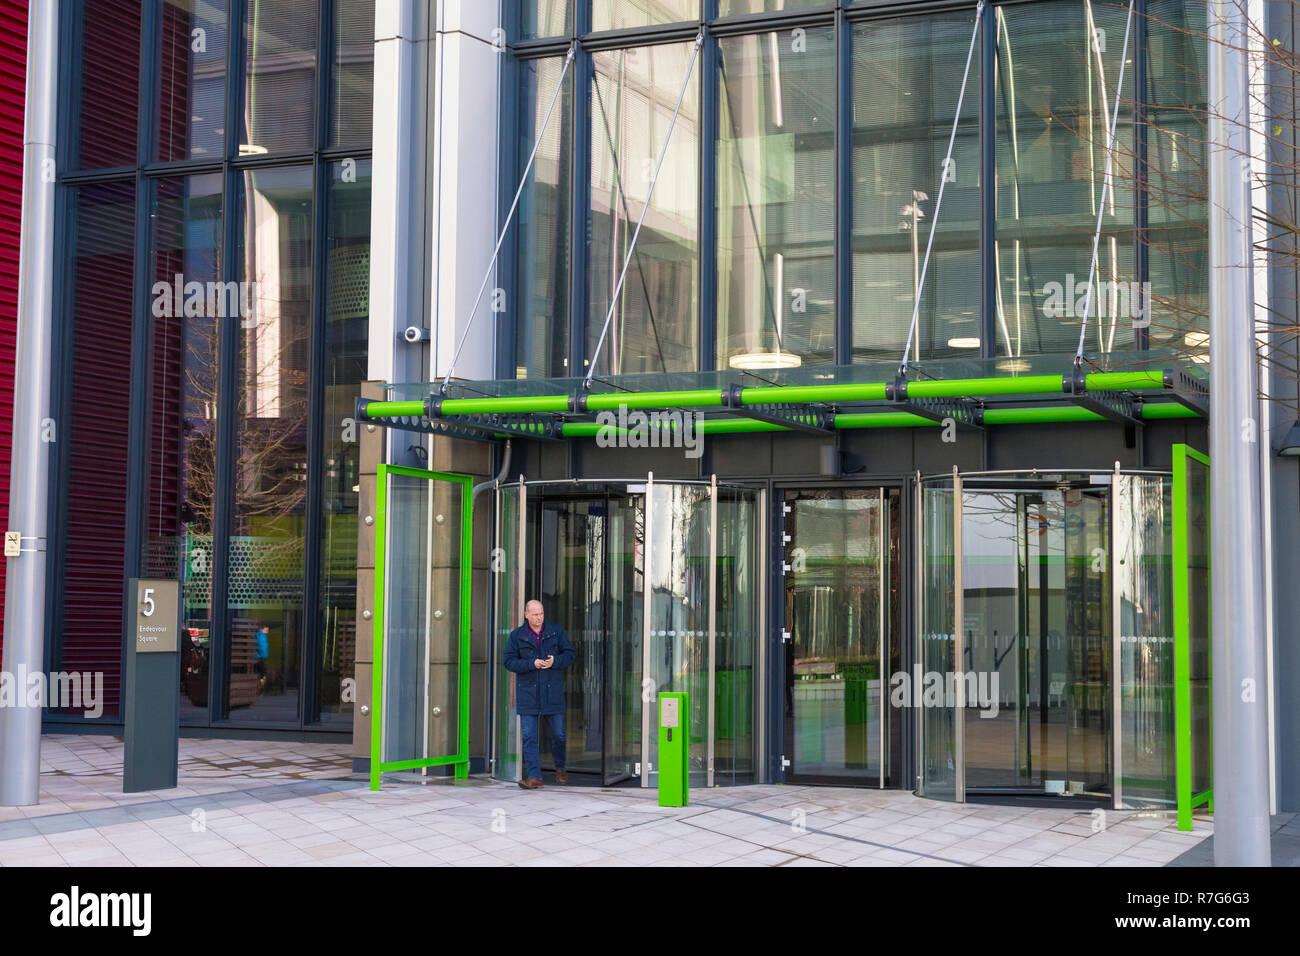 Tfl, transport for london office, endeavour square, stratford, london, uk - Stock Image